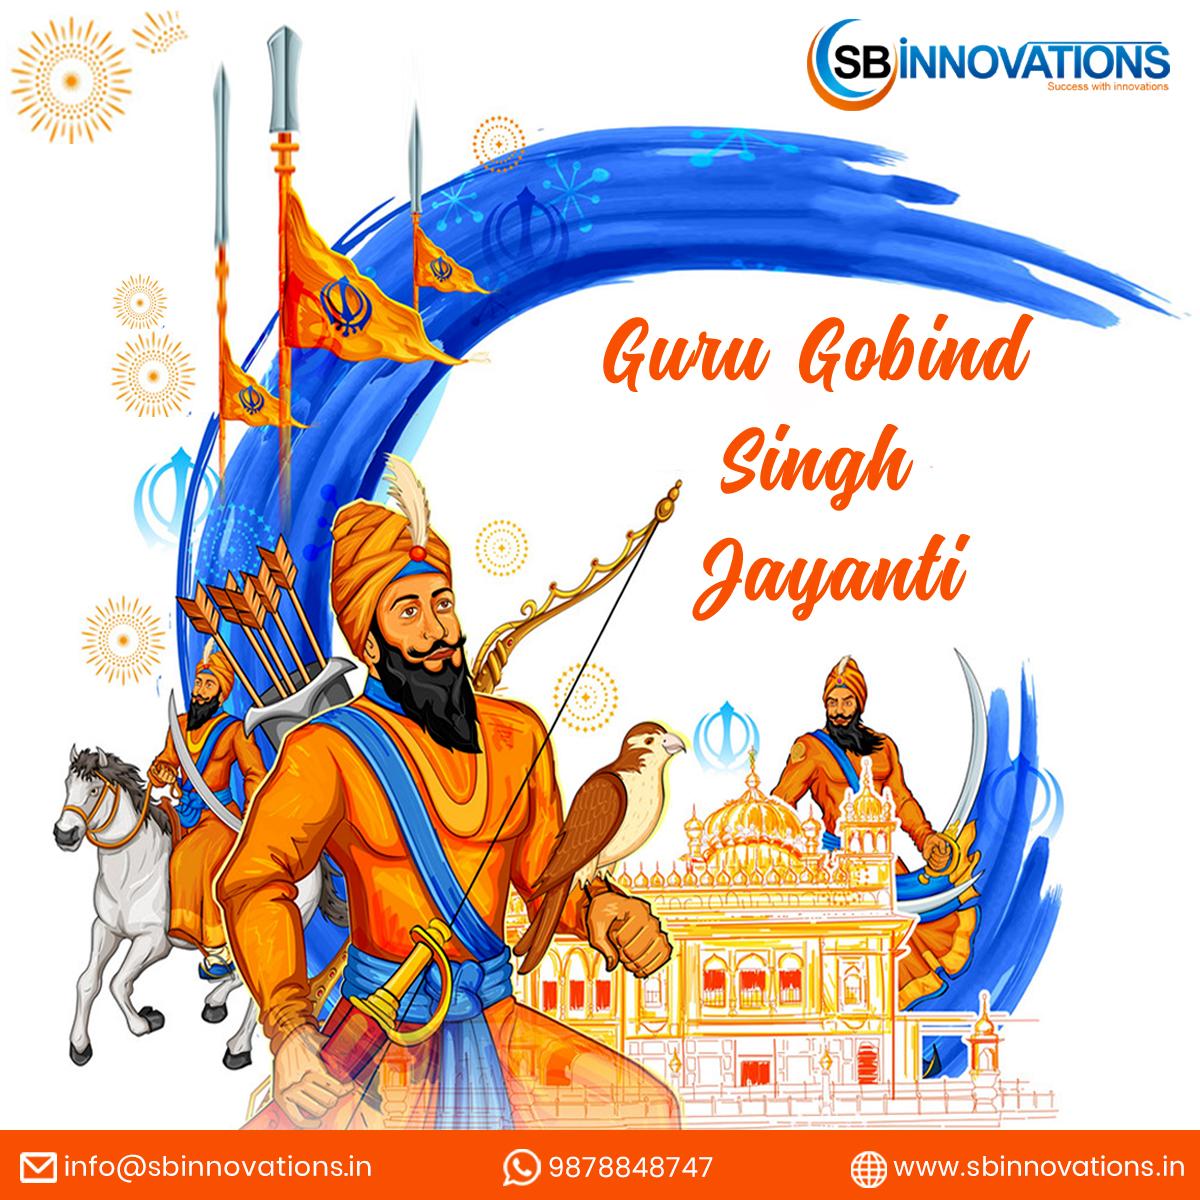 Happy Guru Gobind Singh Jayanti  May the teachings of GuruGobindSingh Ji, a spiritual master, warrior, pure soul, and philosopher, keep guiding us on the path to righteousness and wisdom.  #gurugobindsingh #gurugobindsinghjayanti #guruparab #sikh #khalsa #GuruGobindSinghJayanti